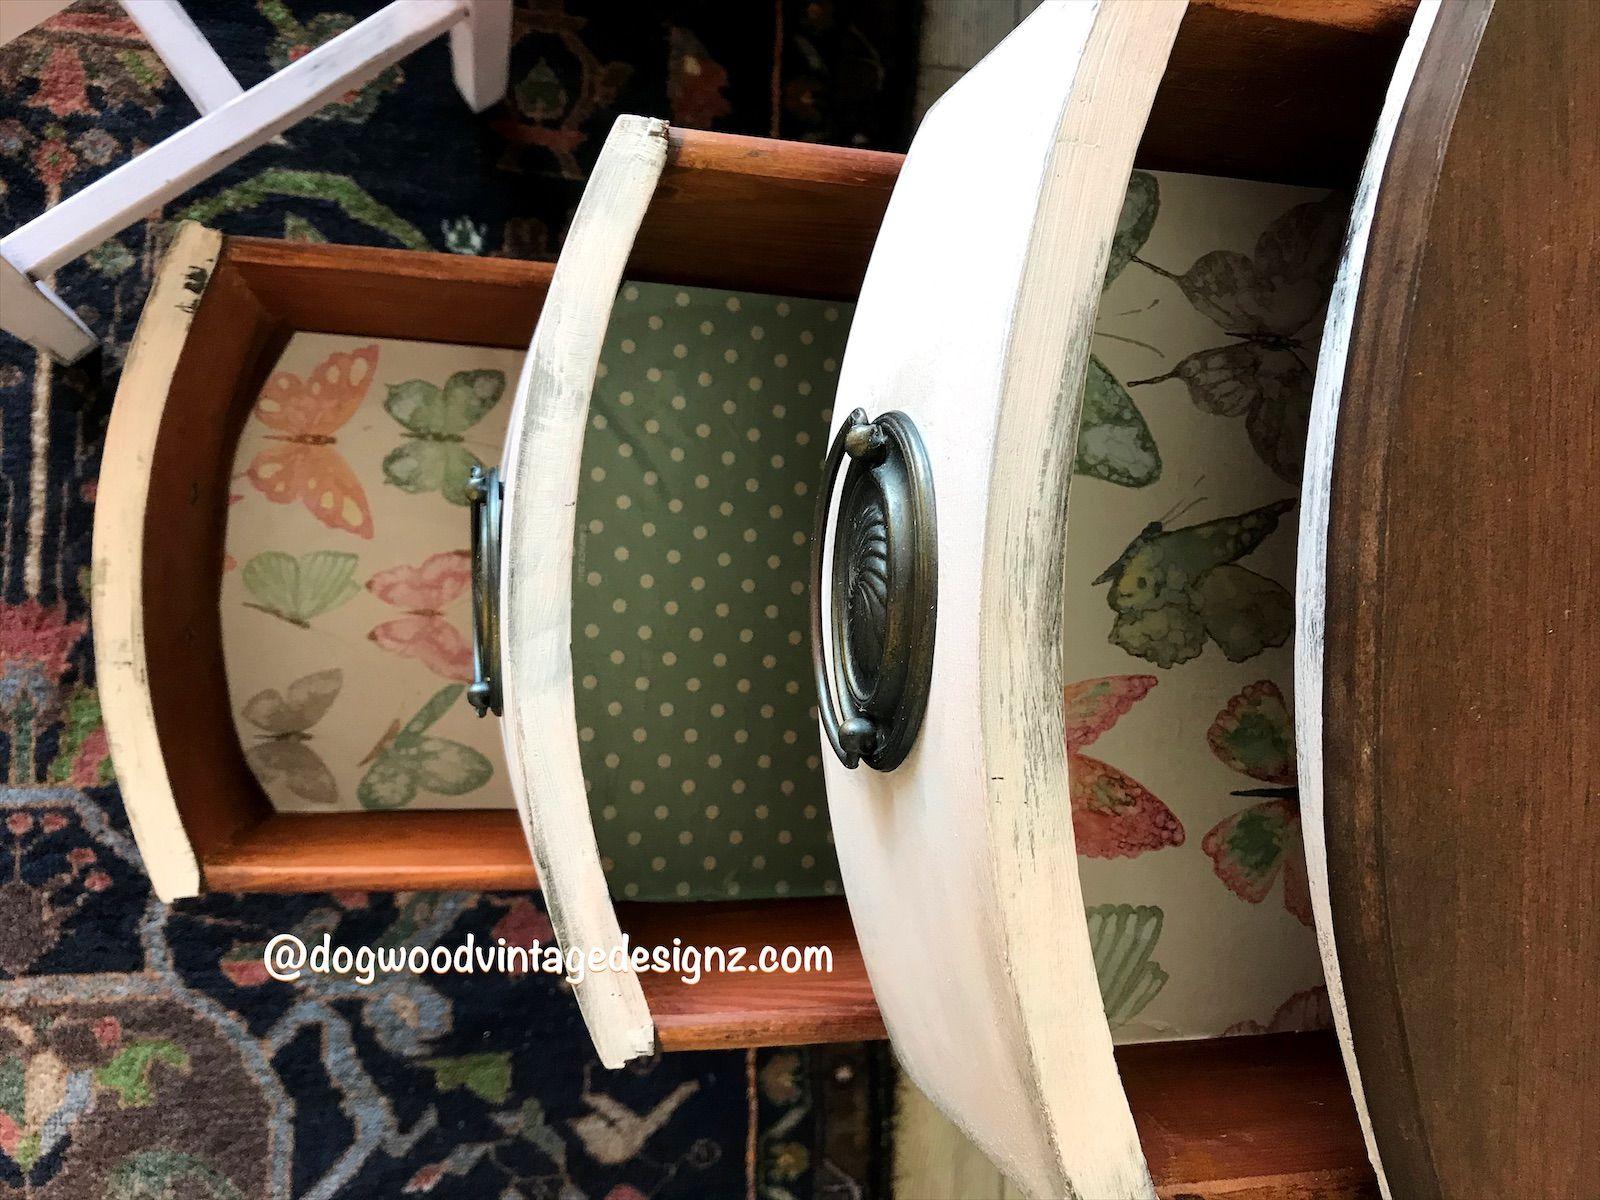 #rusticelegance #paintedfurniture #furnitureartist #bohostyle #furnitureflip #debisdesigndiary #diypaintco #vintagefurniture #interiors #design #art #handpainted #textured #upcycled #eclectichome #etsyshop #blue #turquoise #bohemian #antiquesupcycled #pink #cowgirlchic